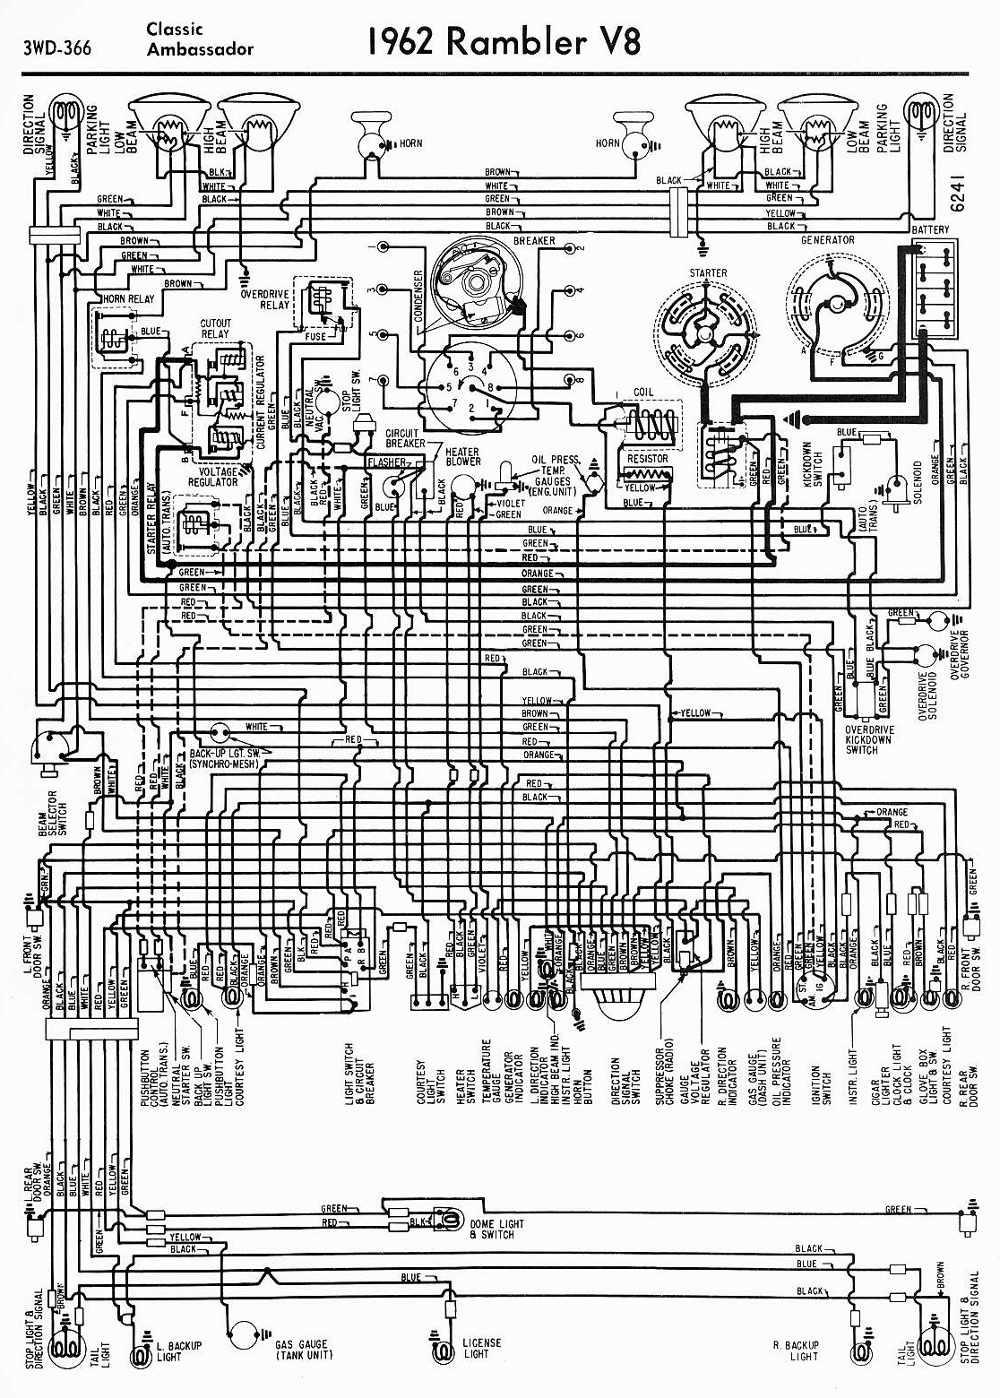 medium resolution of amc car manuals wiring diagrams pdf fault codes 1973 amc ambassador 1973 amc wiring diagram